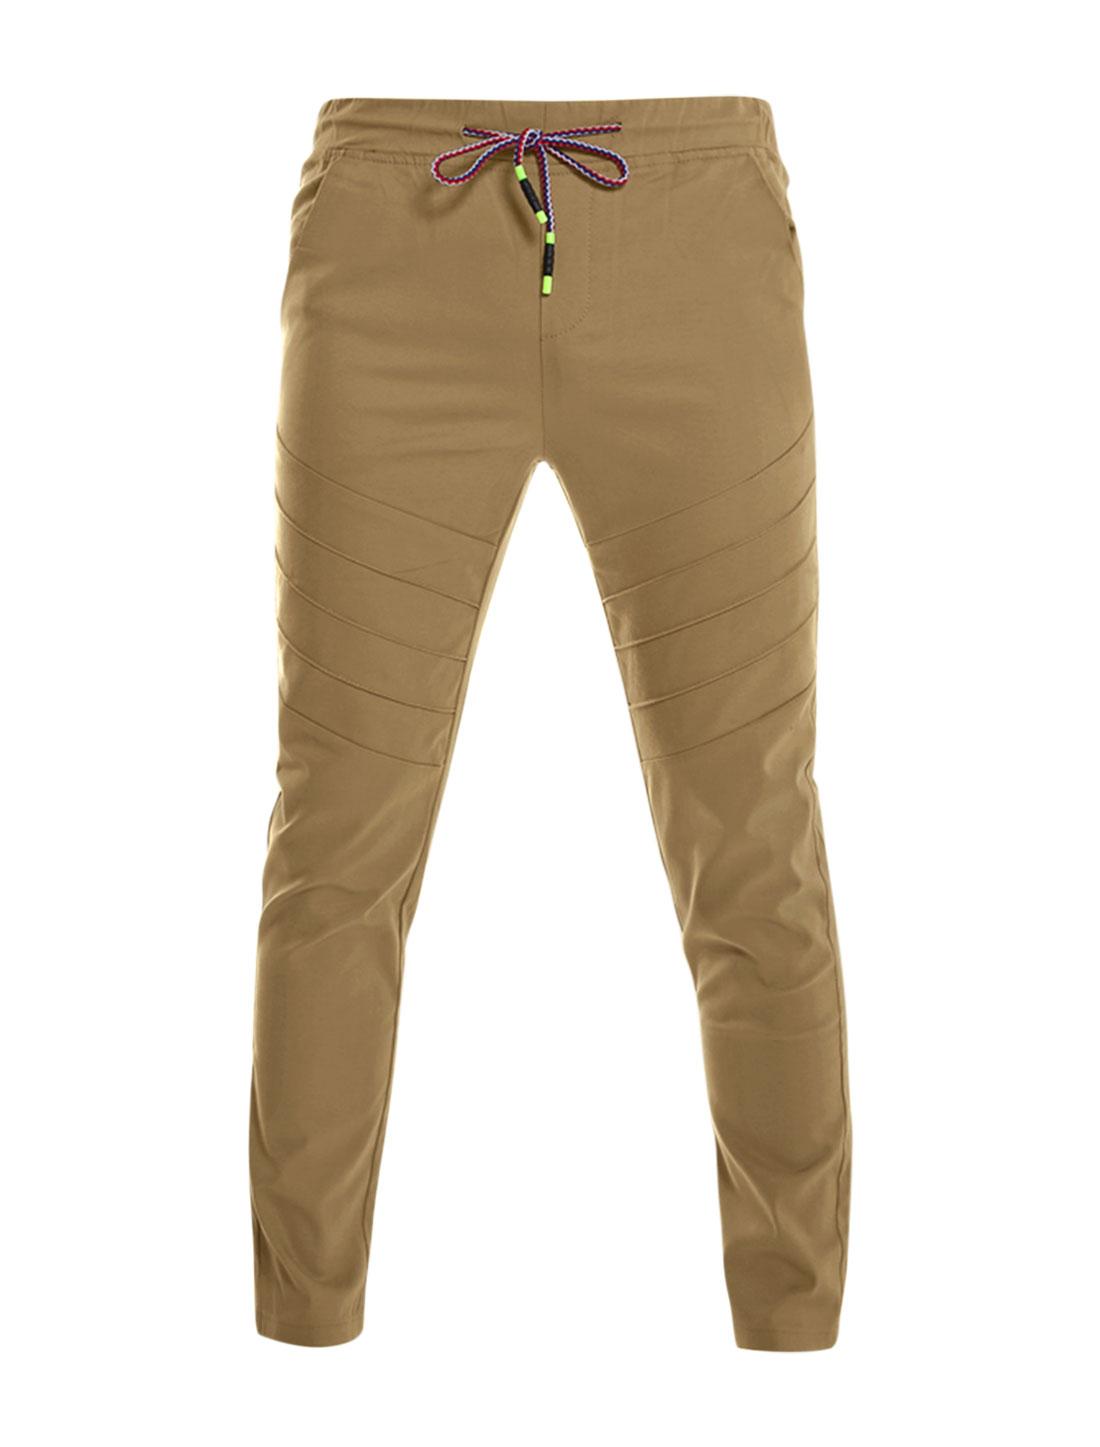 Men Drawstring Elastic Waist Slant Pocket Pleated Front Pants Brown W32